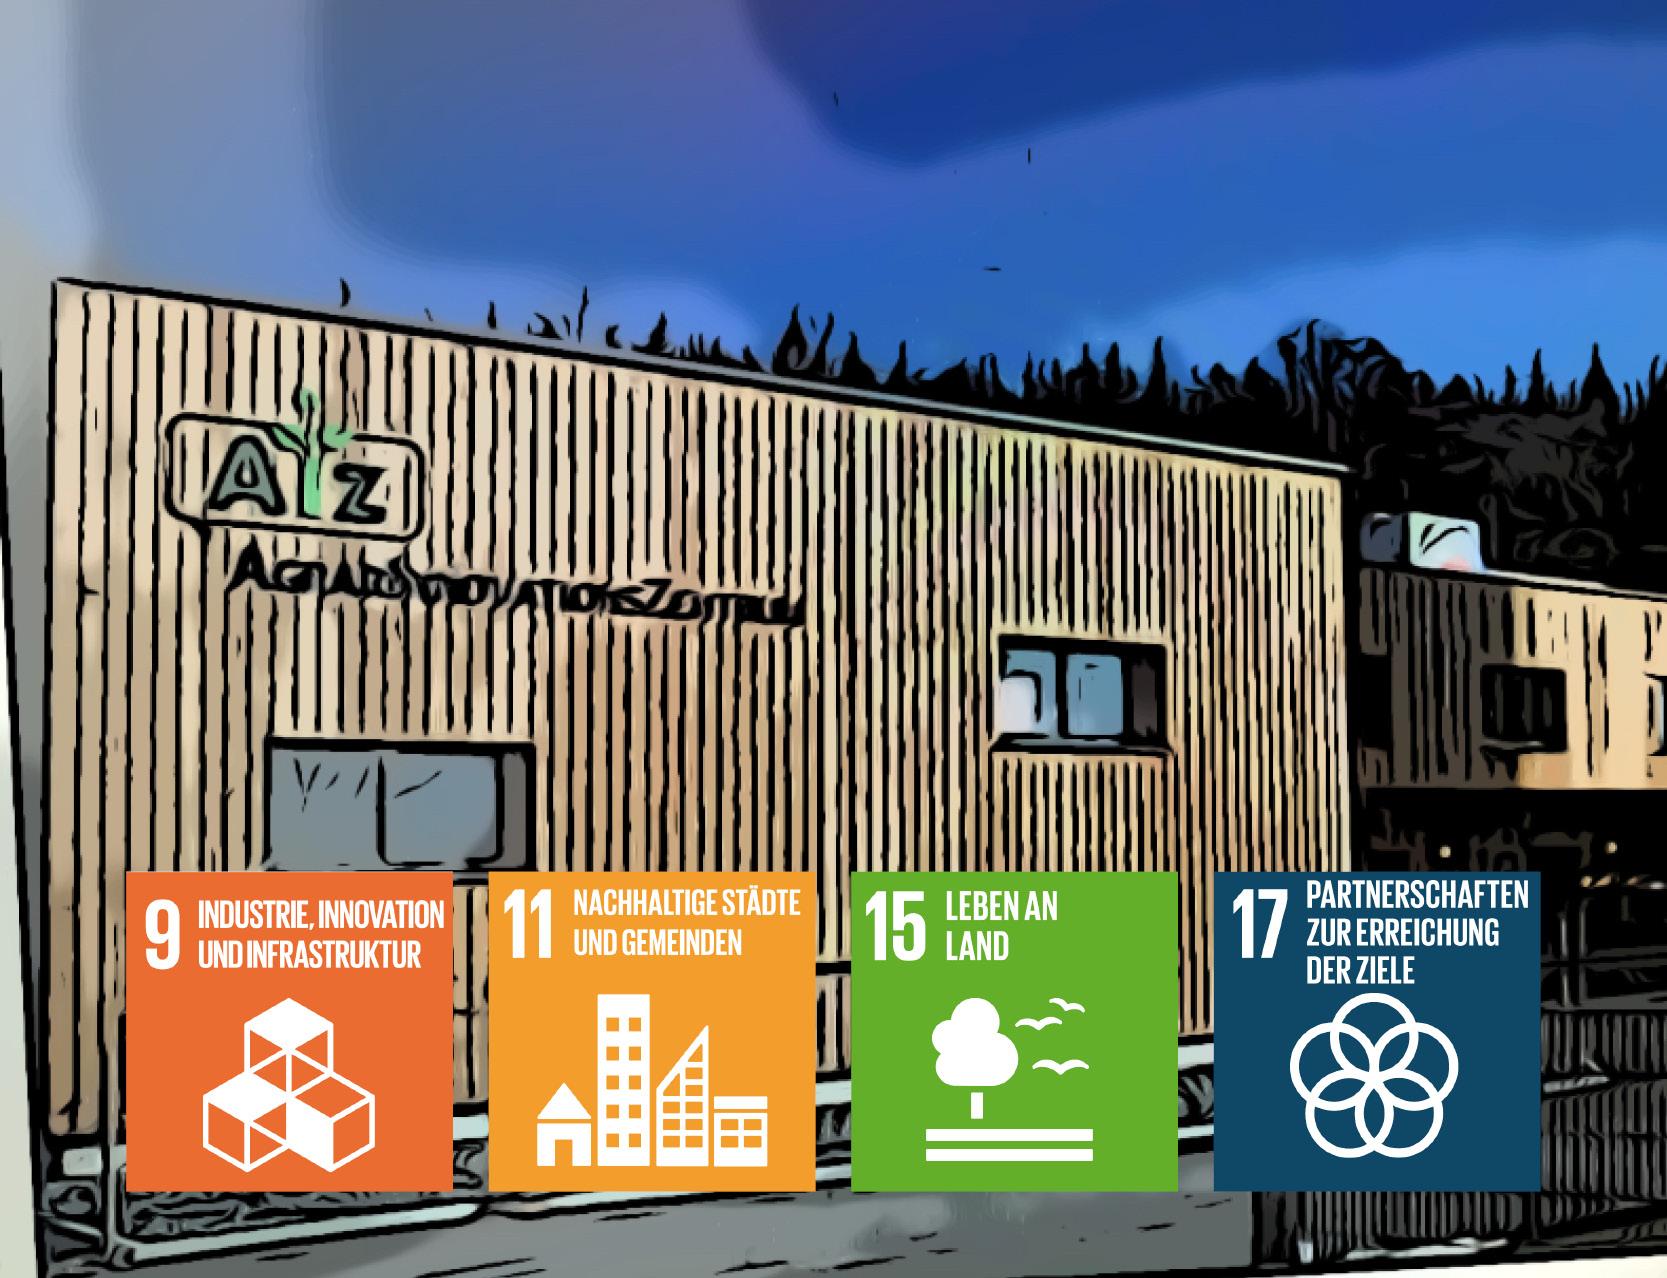 #4 Agrarinnovationszentrum Kärnten